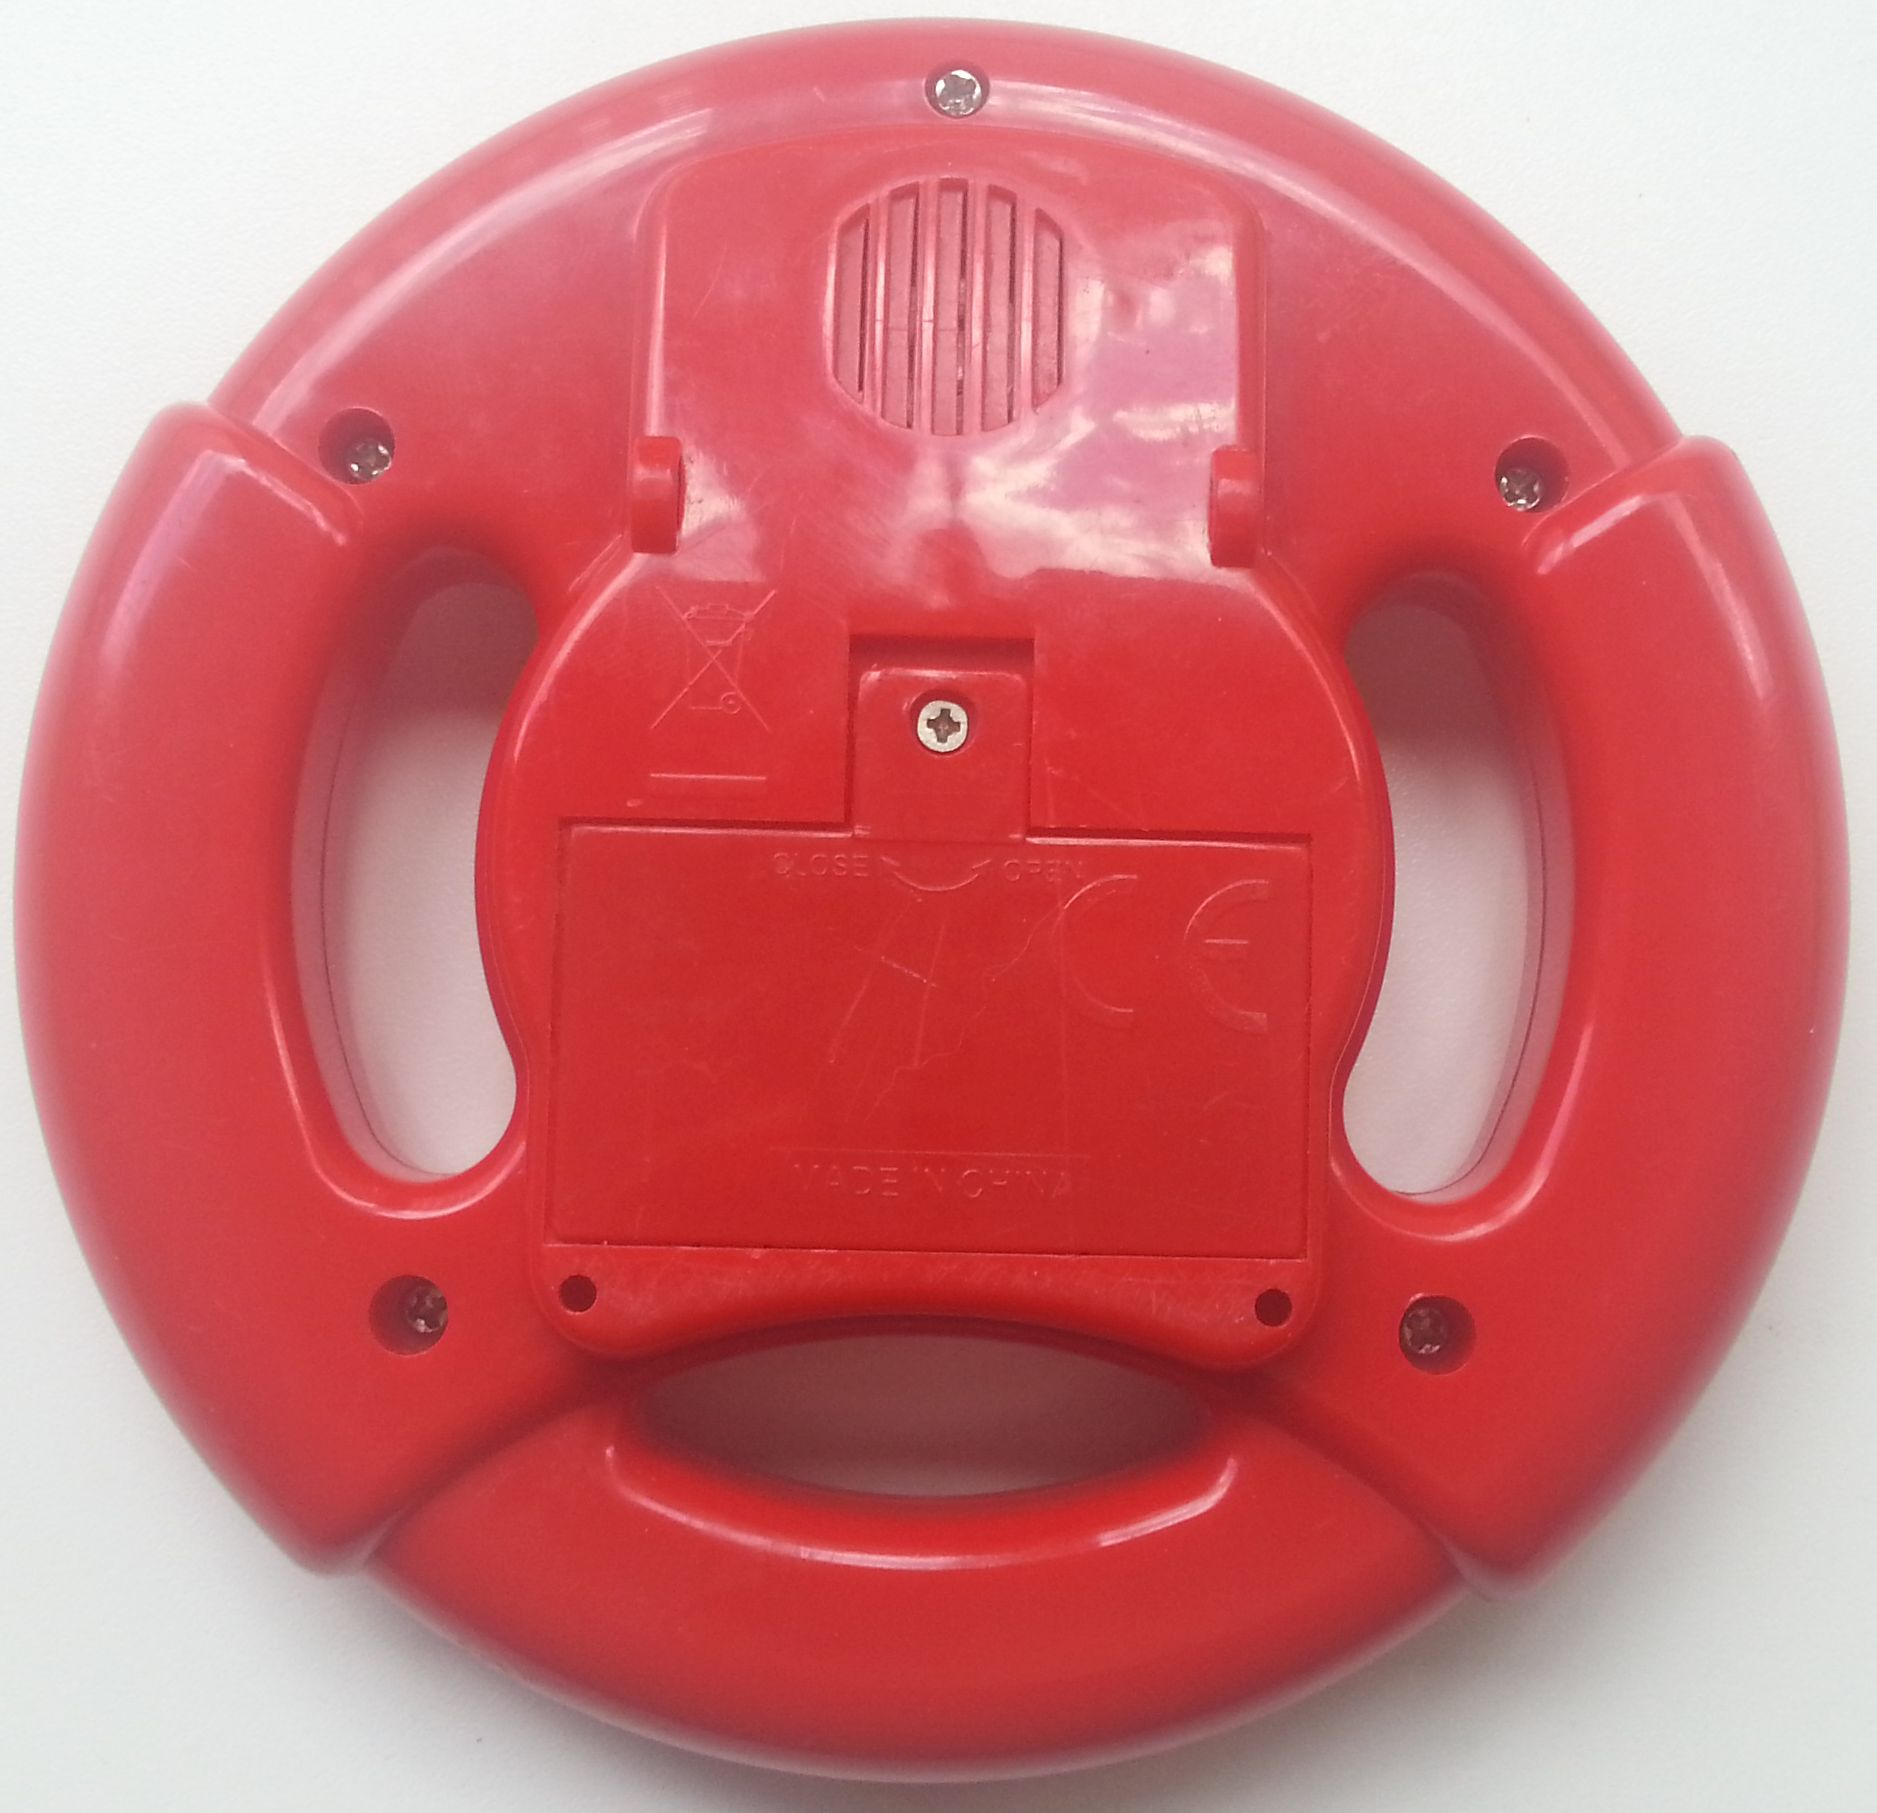 Speelgoed Simba Toys Race Wiel